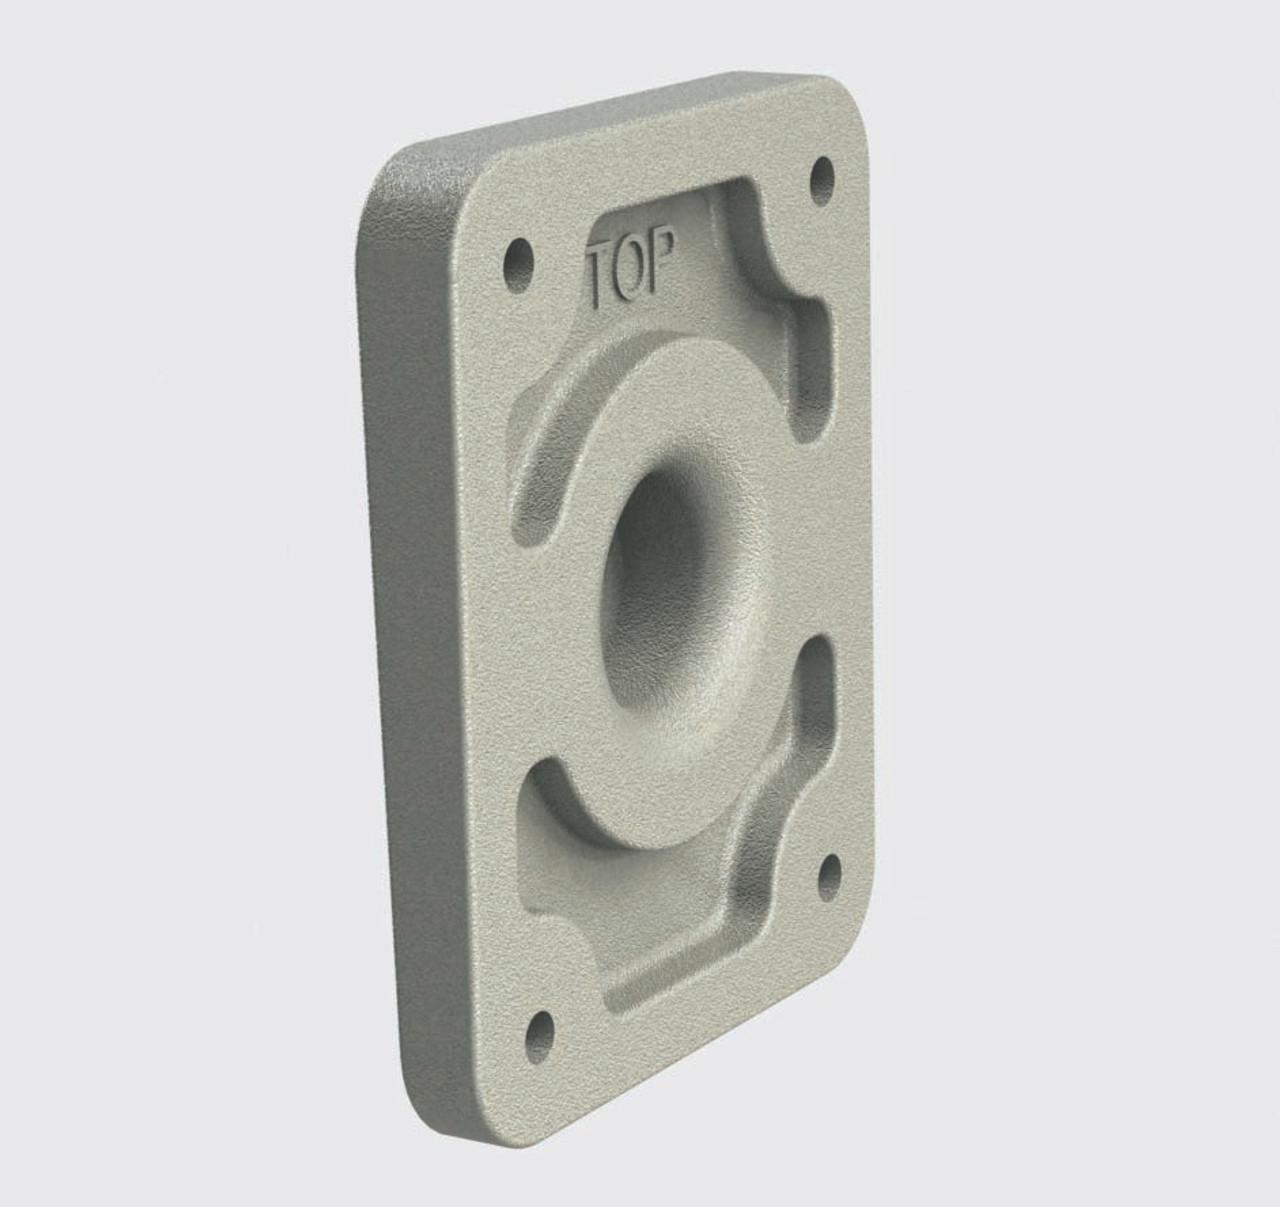 500320 --- FULTON XP to F2 Jack Adpater Kit